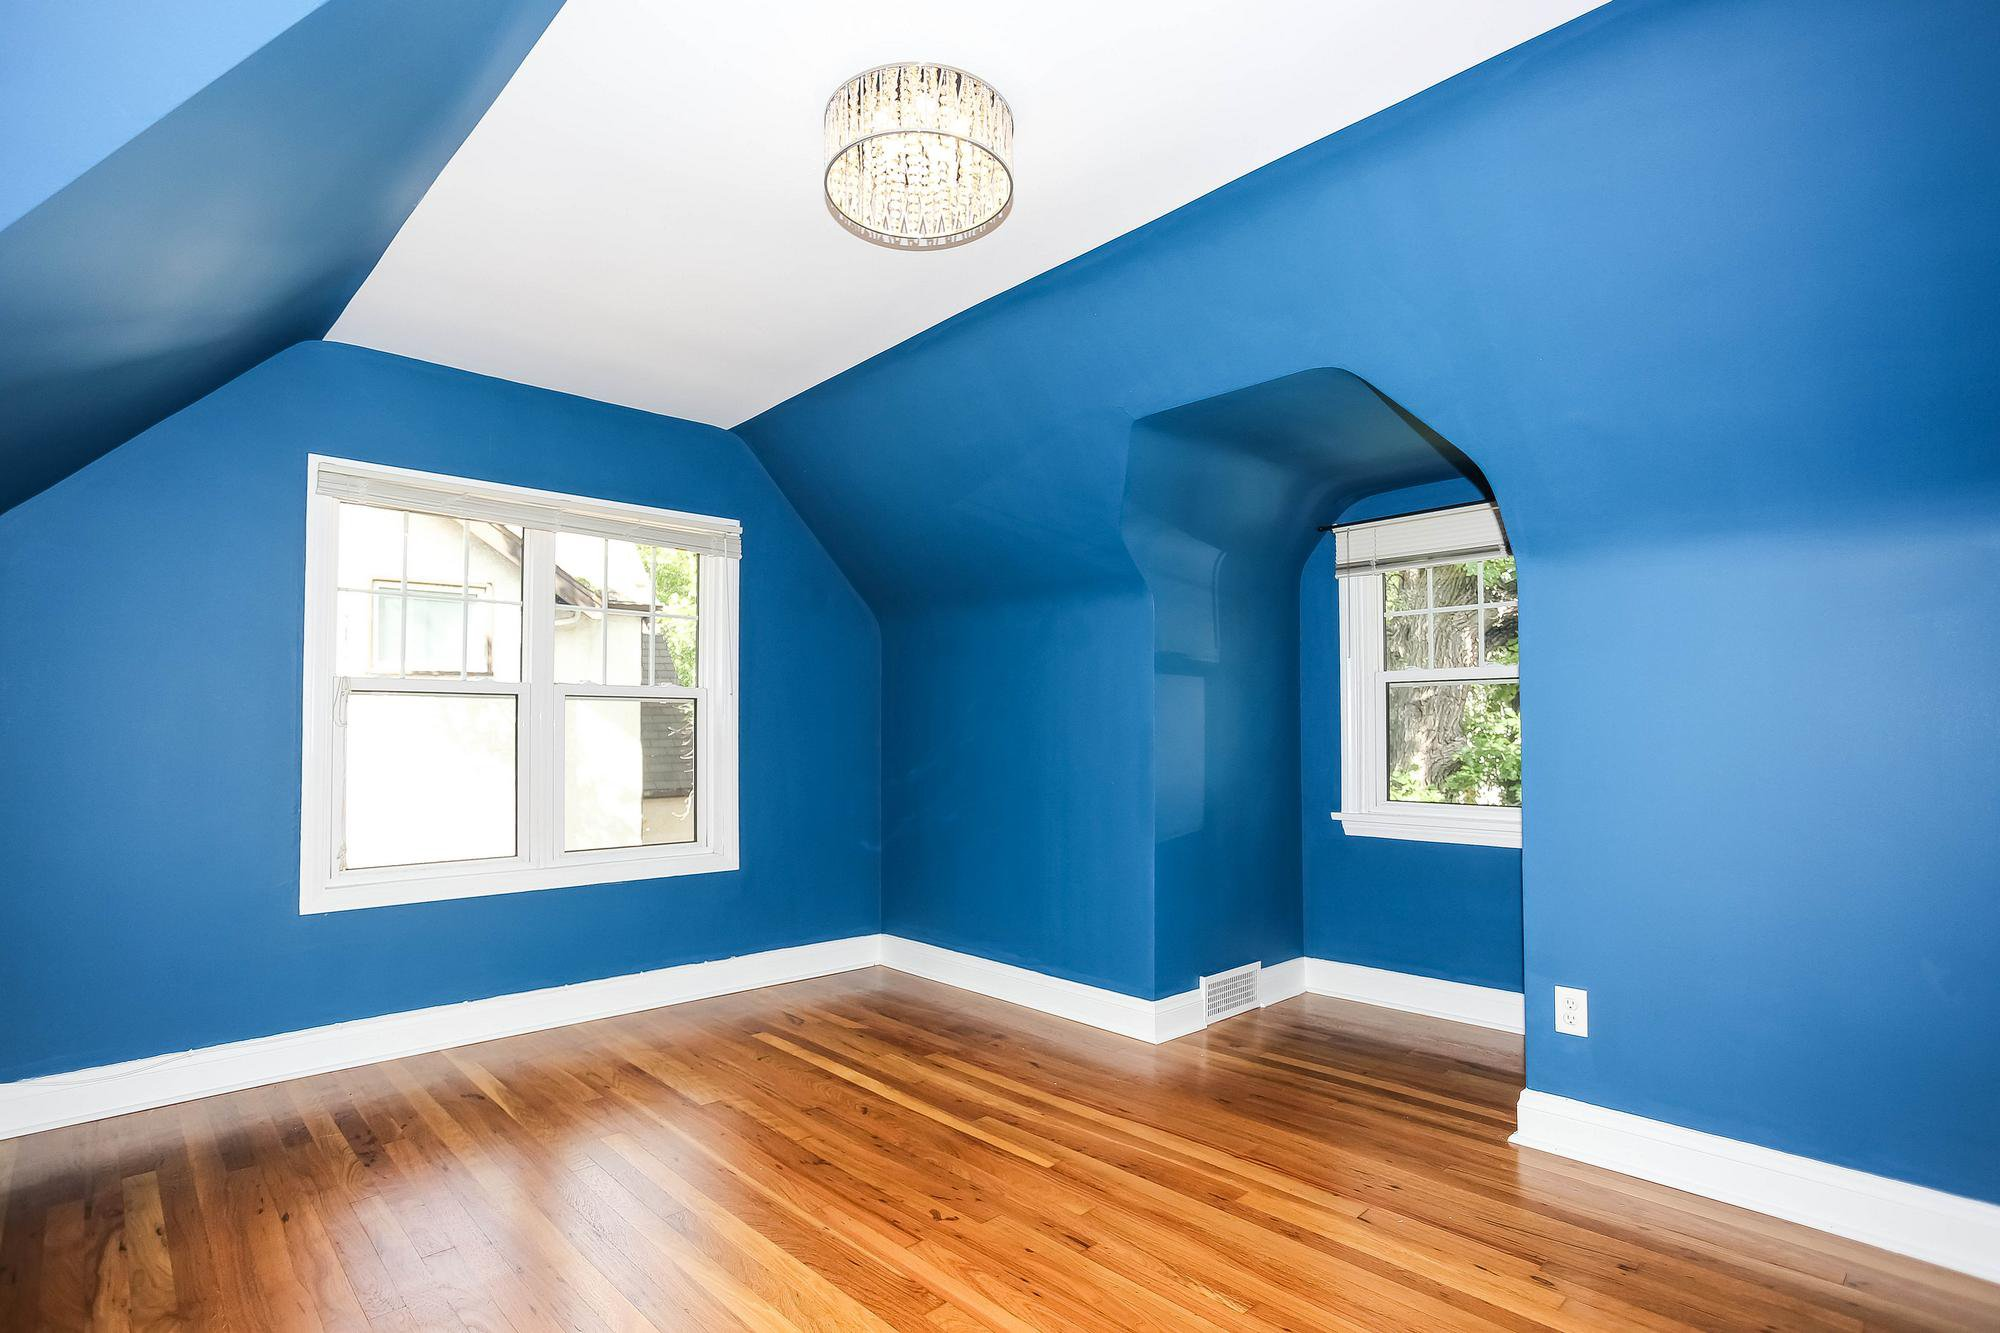 Photo 21: Photos: 155 Borebank Street in Winnipeg: River Heights Single Family Detached for sale (1C)  : MLS®# 202017166